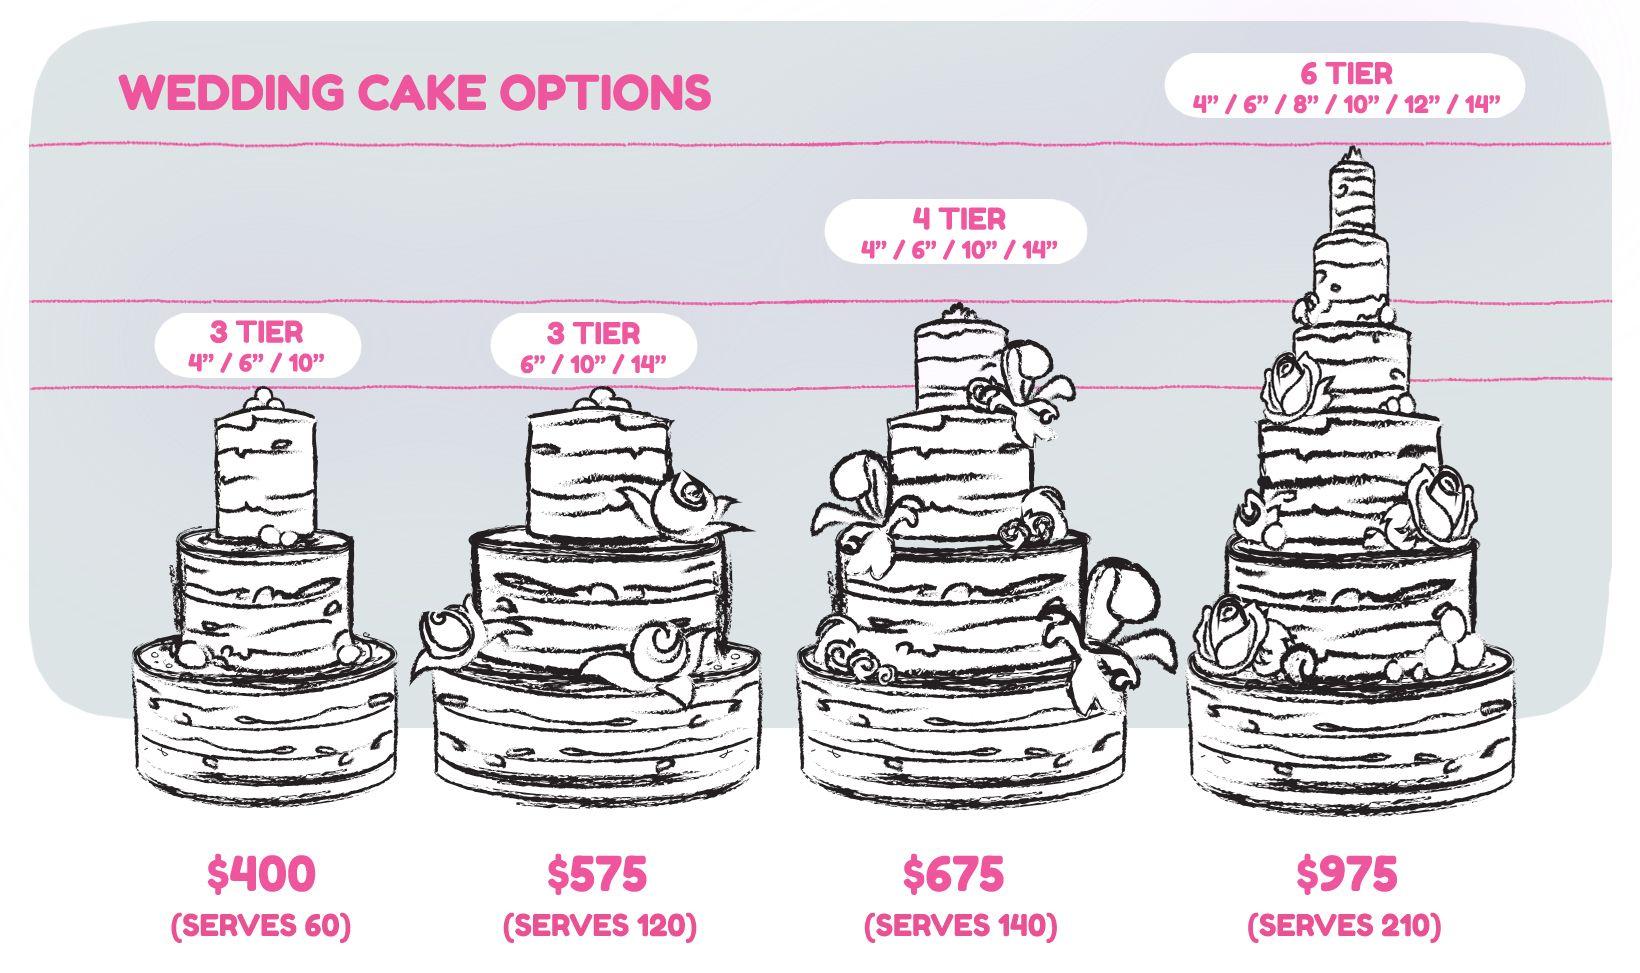 Wedding Cake Options Flavors 4 Tier Prices